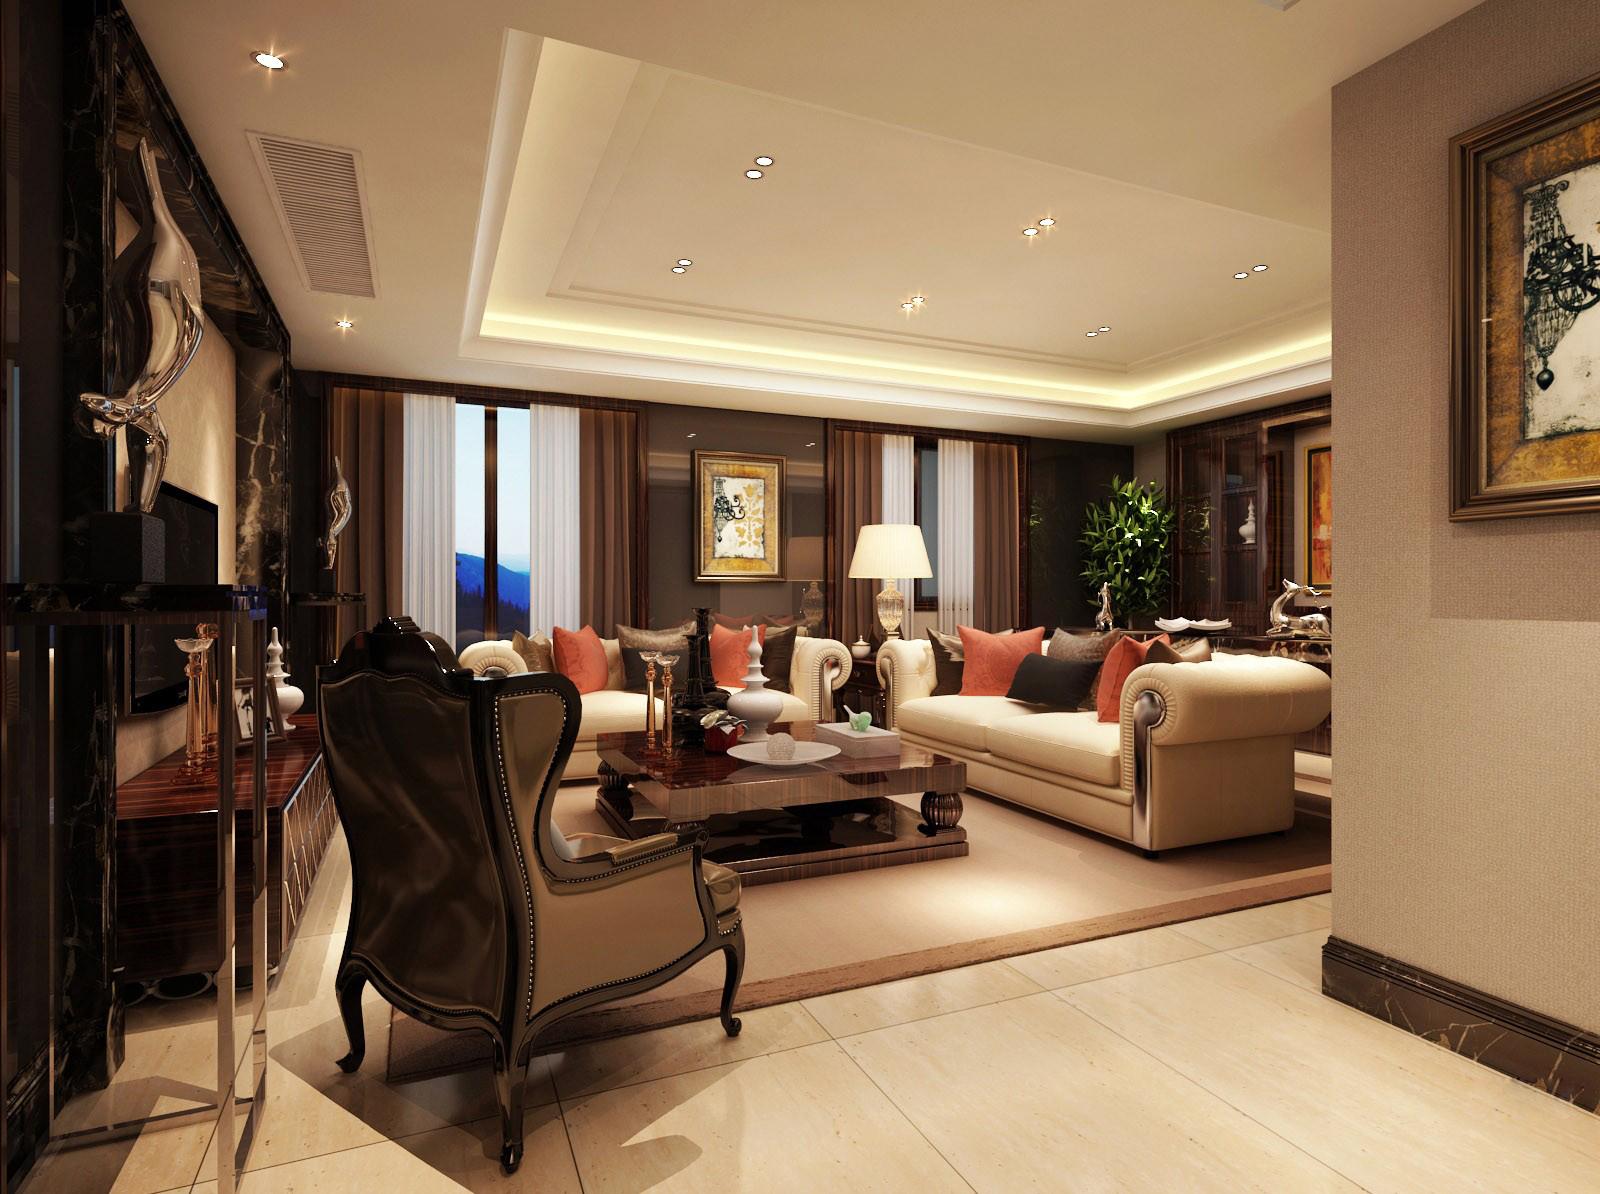 Modern Living Room Fully Furnished 3d Model Max 1 Amazing Design